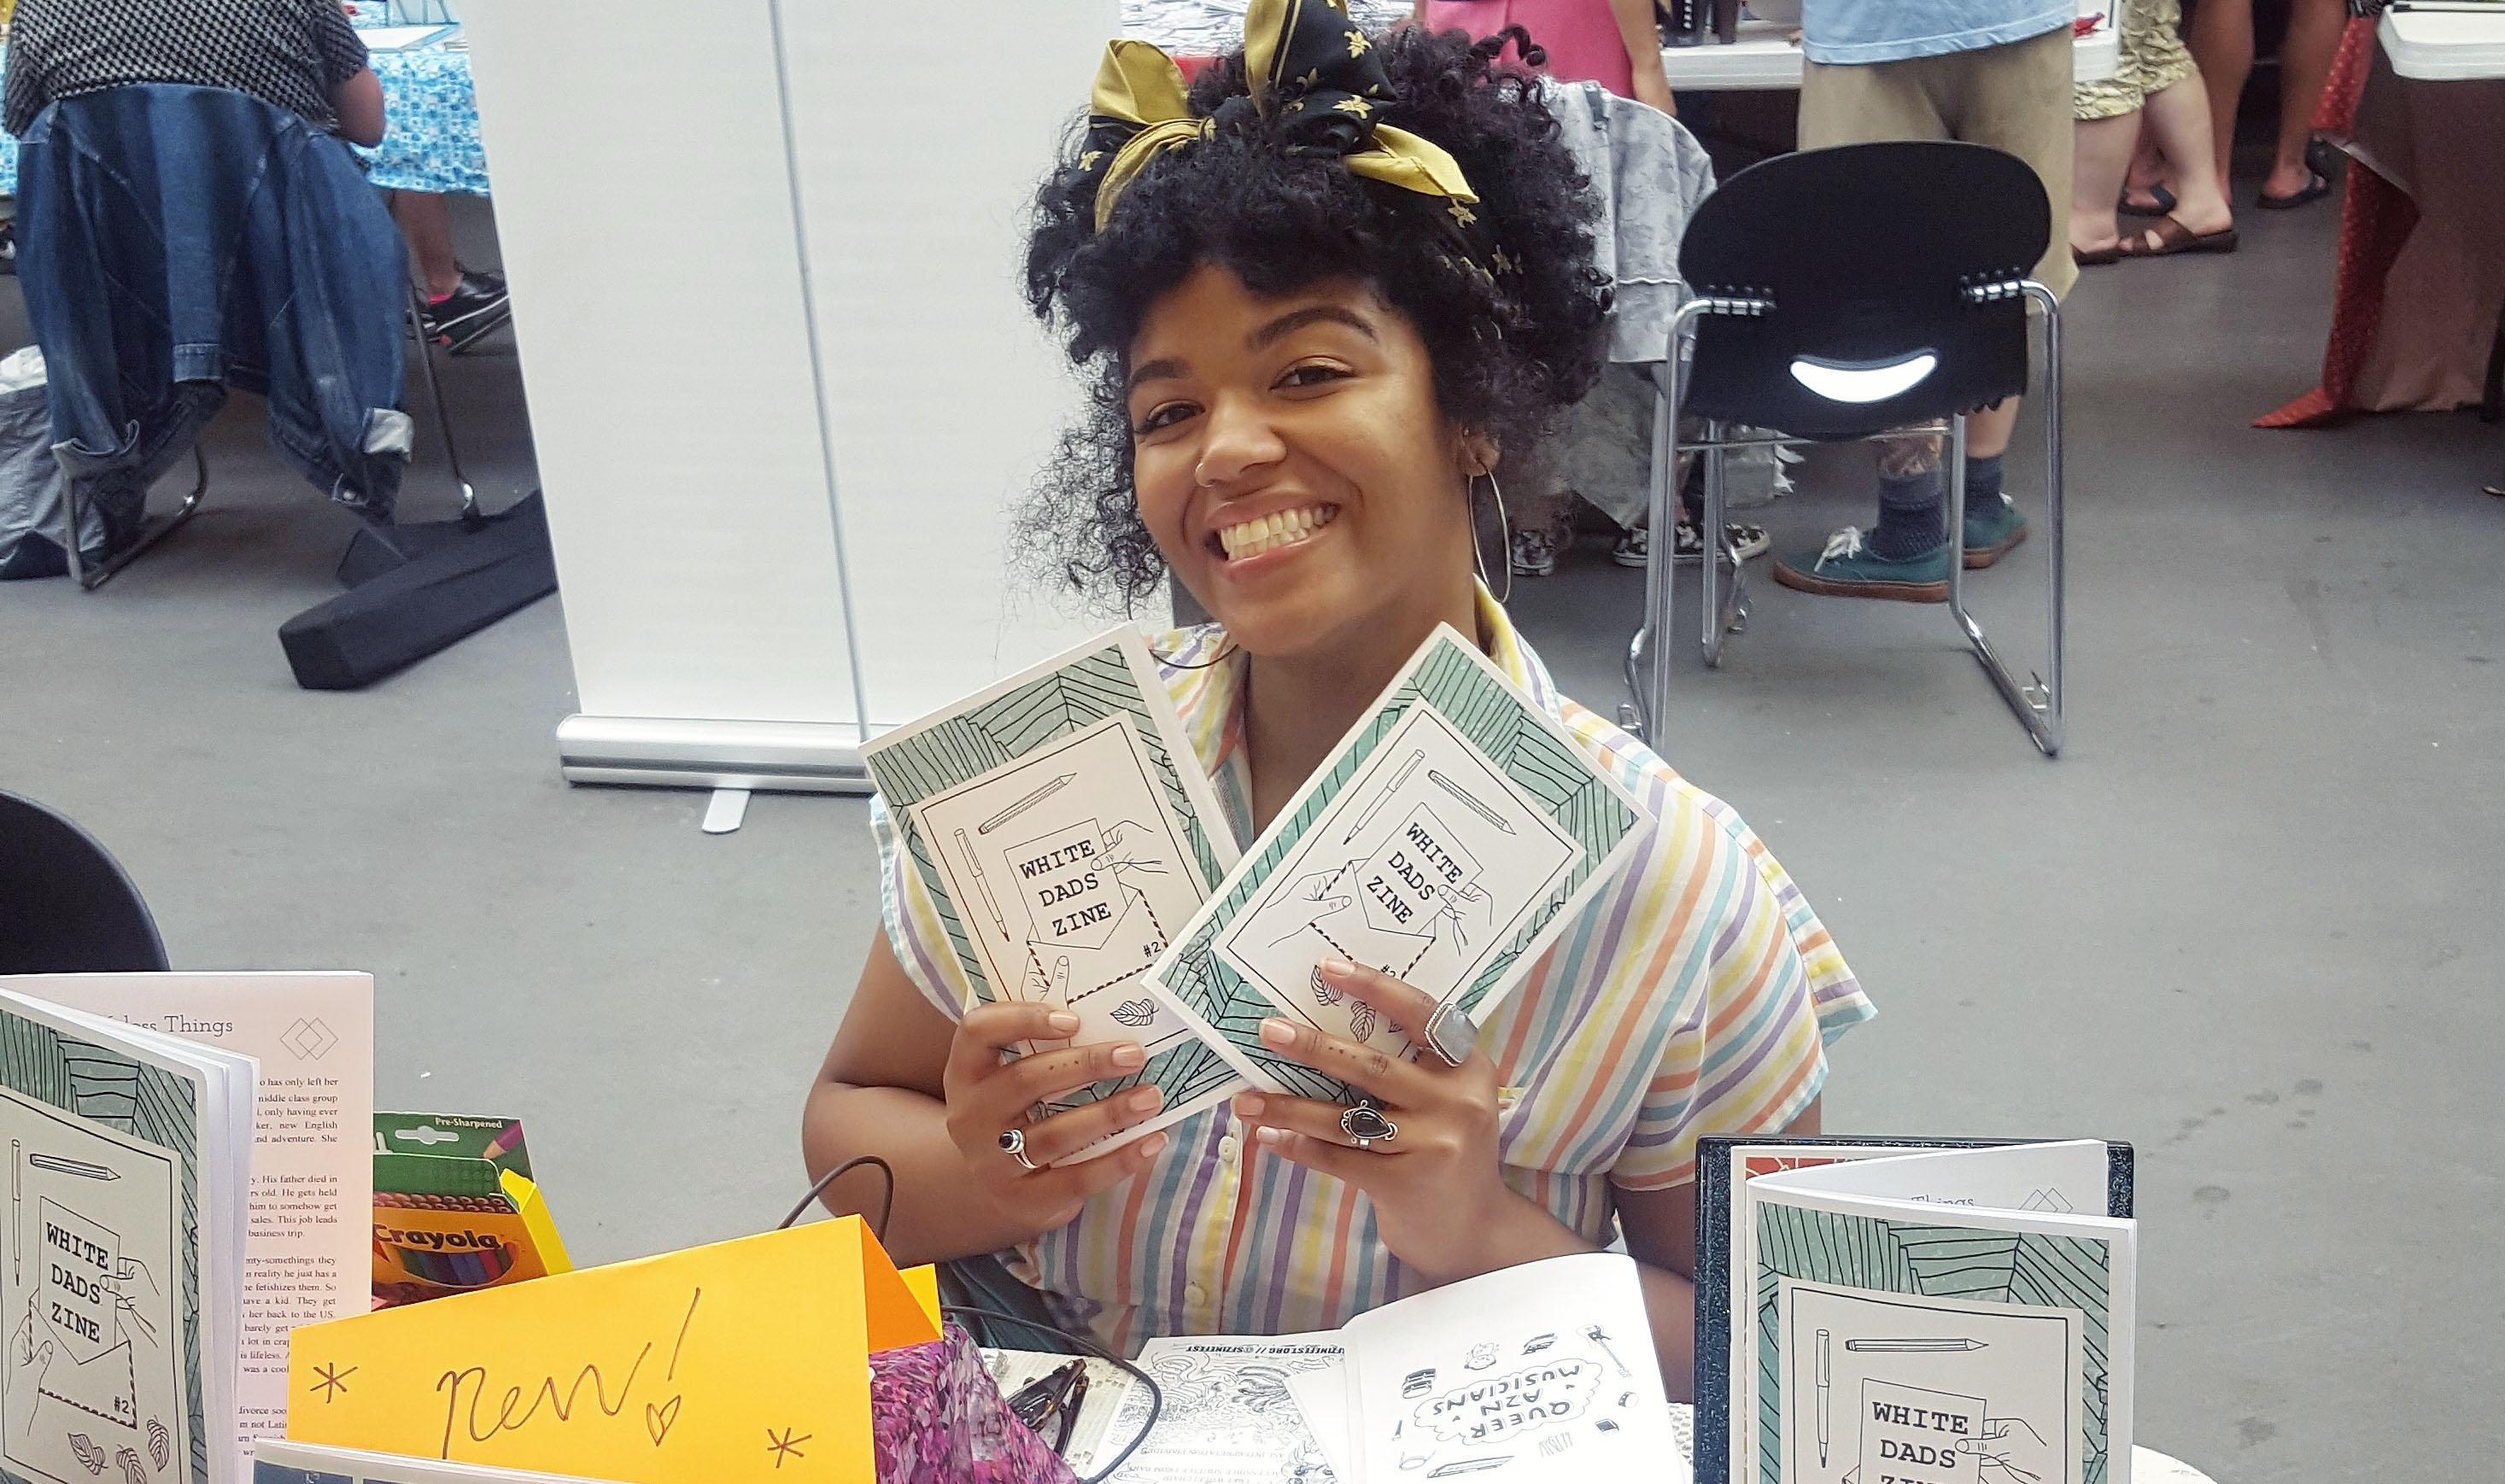 Sarah Grace Gladstone at San Francisco Zine Fest in September, 2017